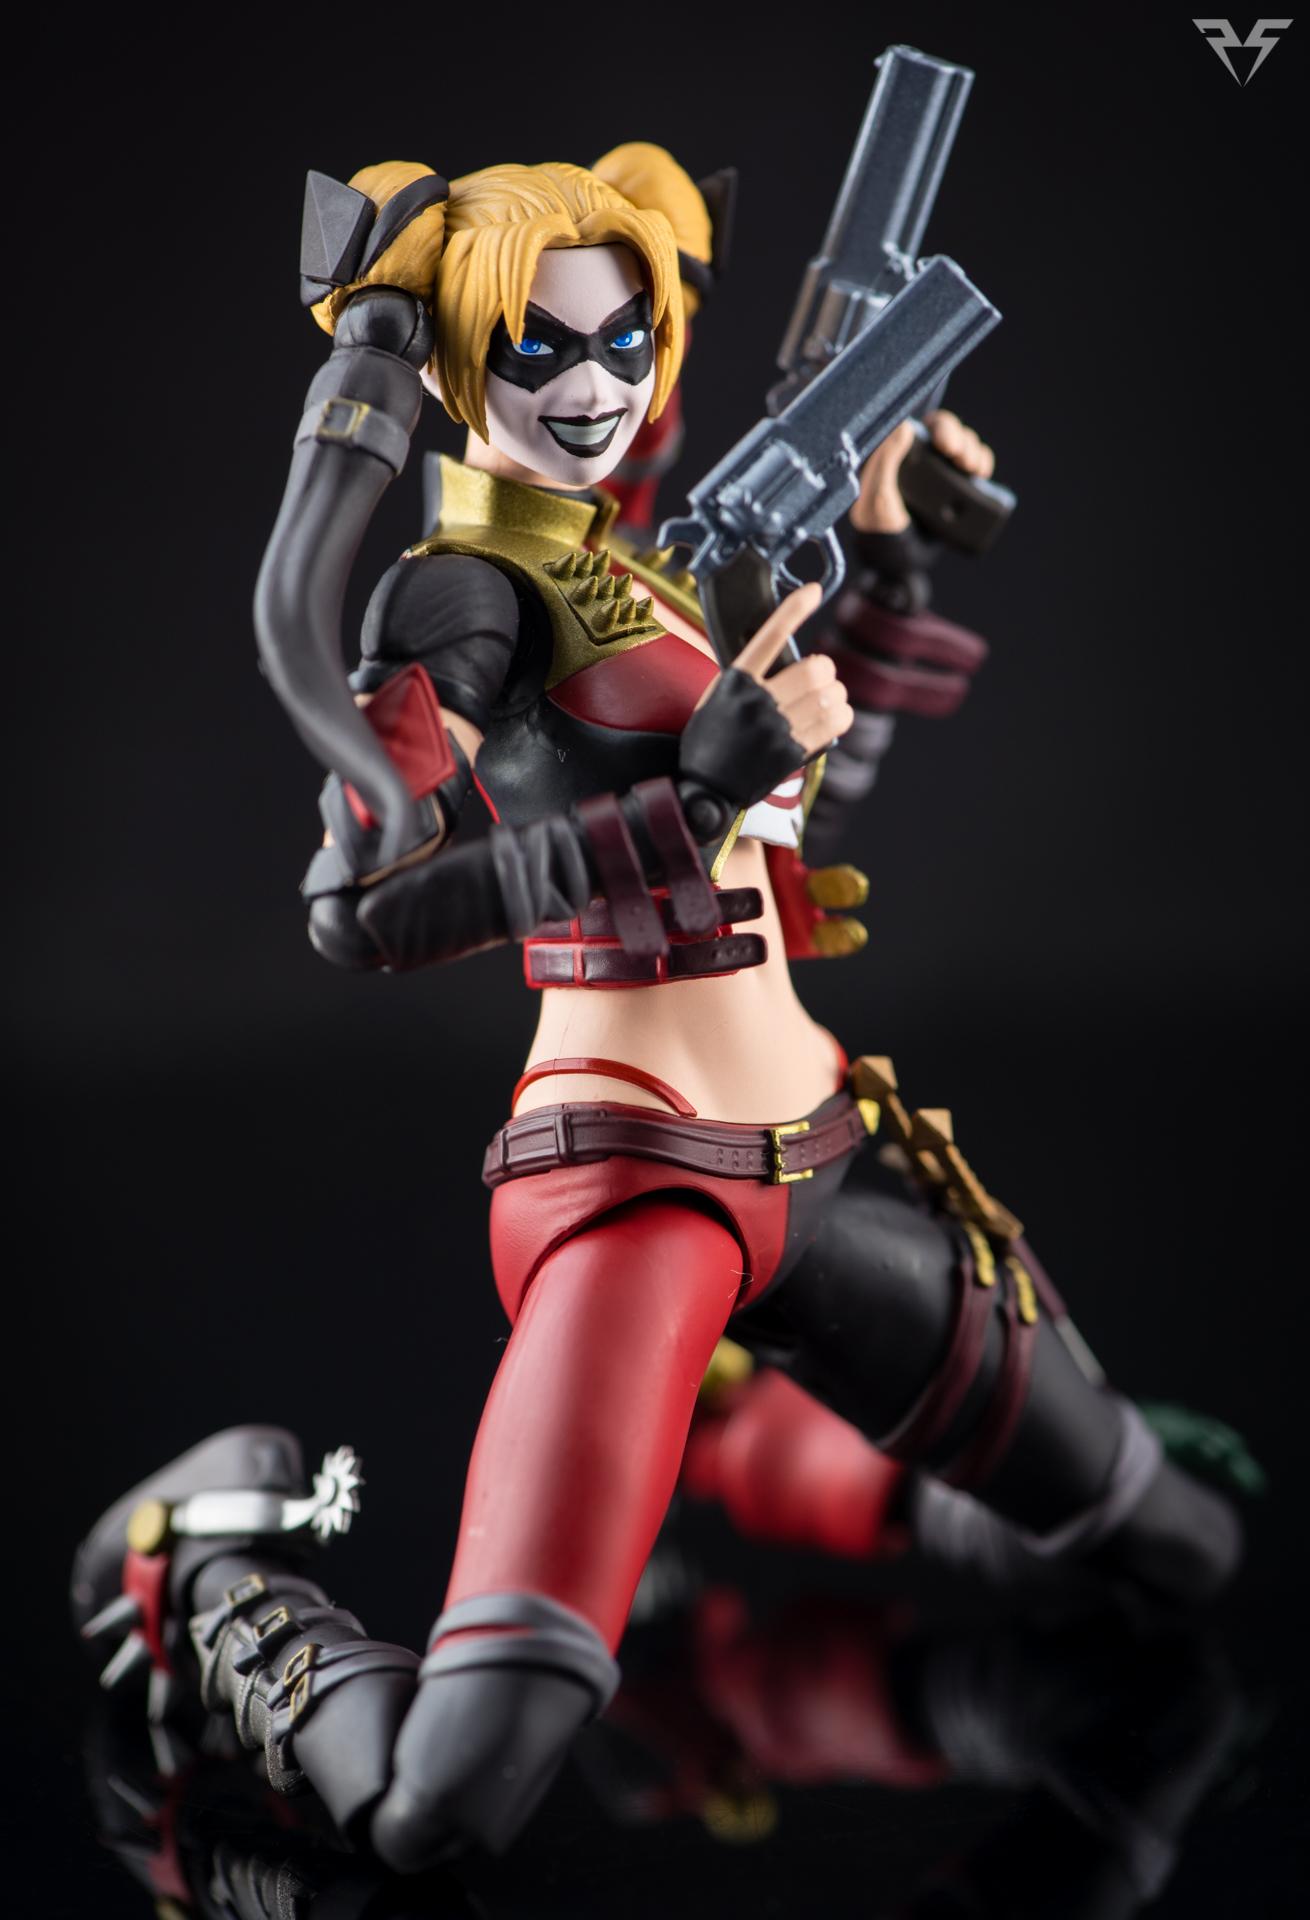 Figuarts Harley Quinn-7.jpg